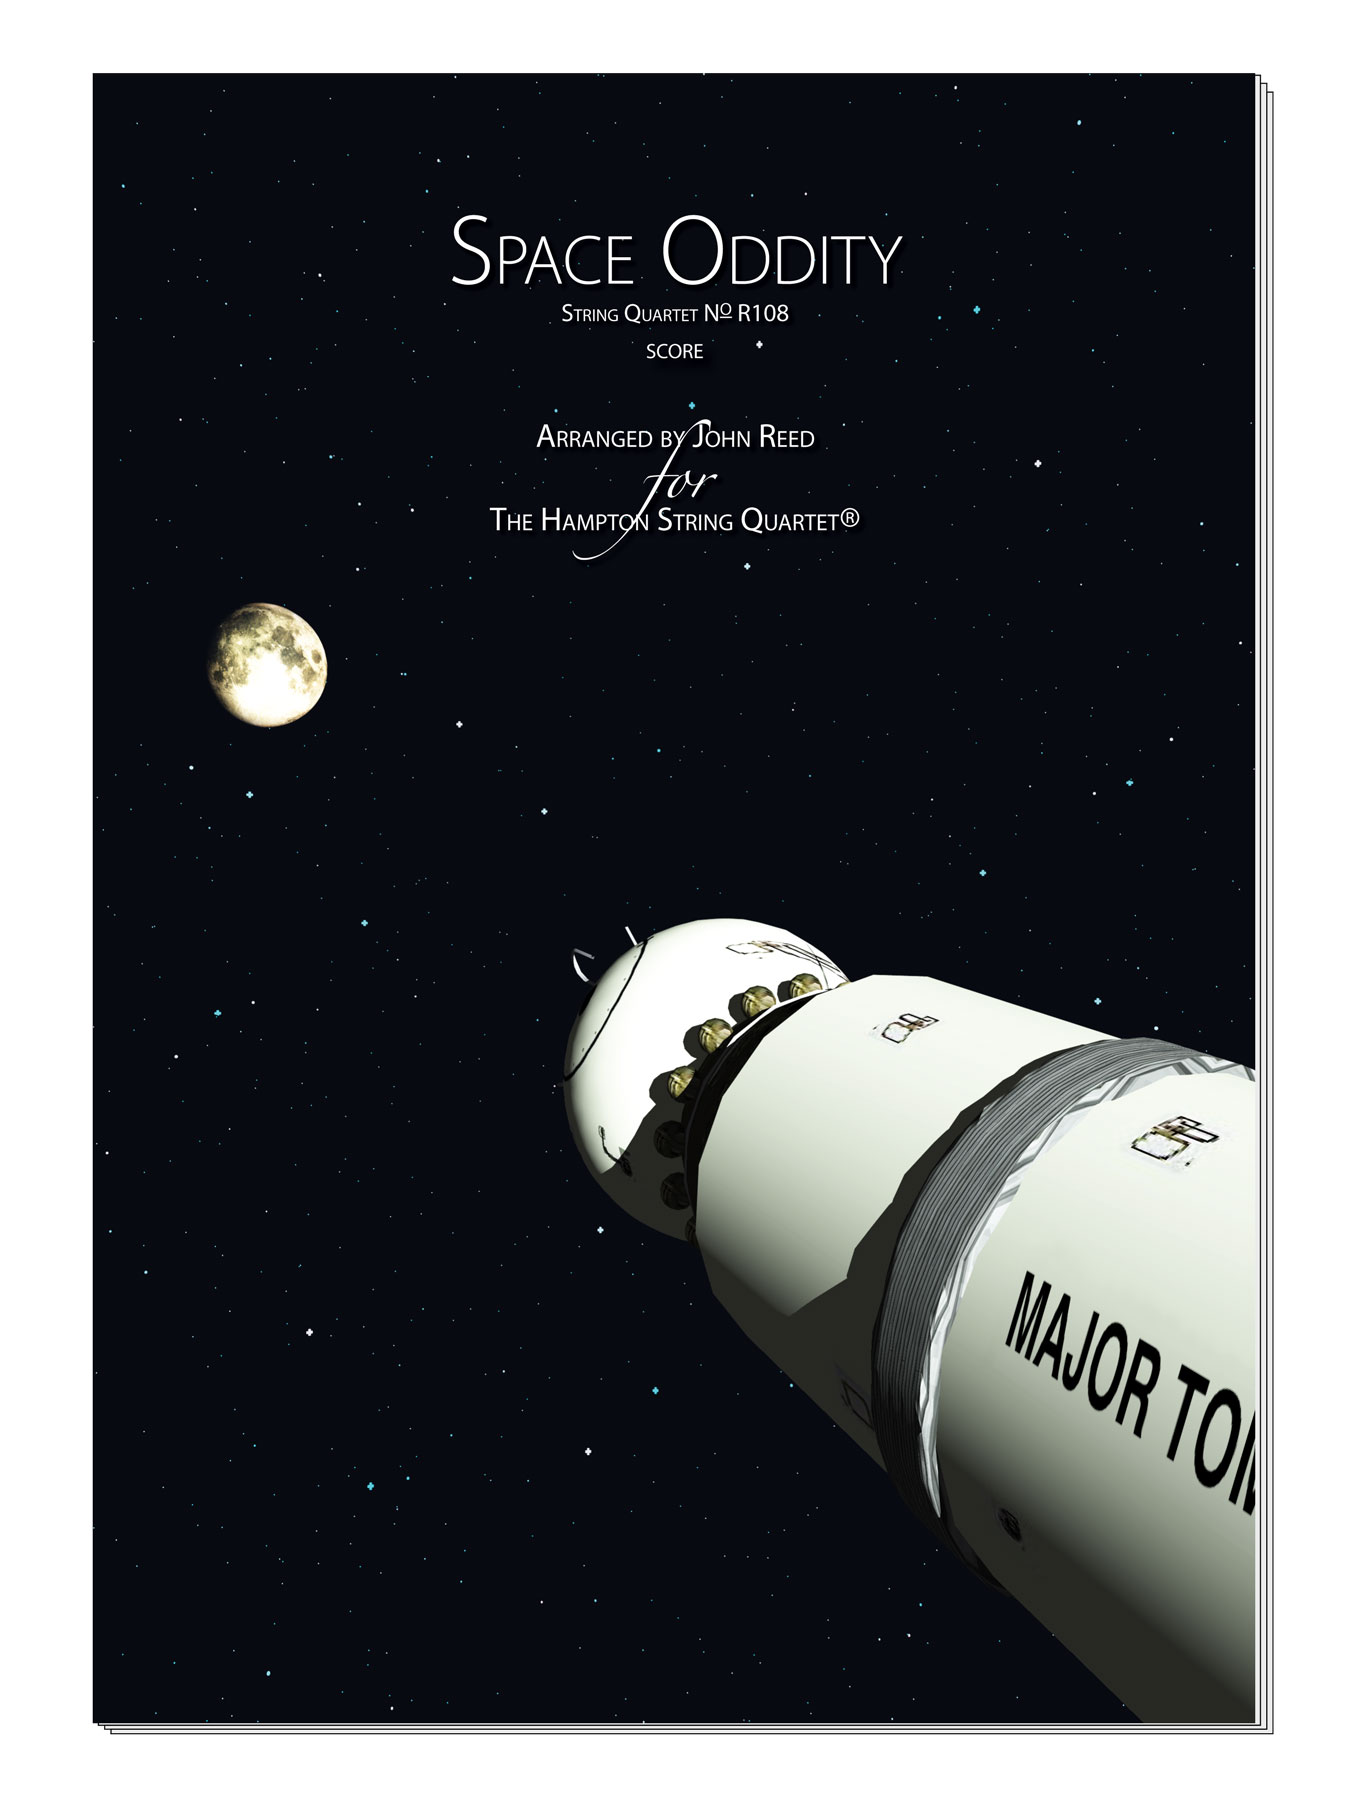 SpaceOddity.jpg